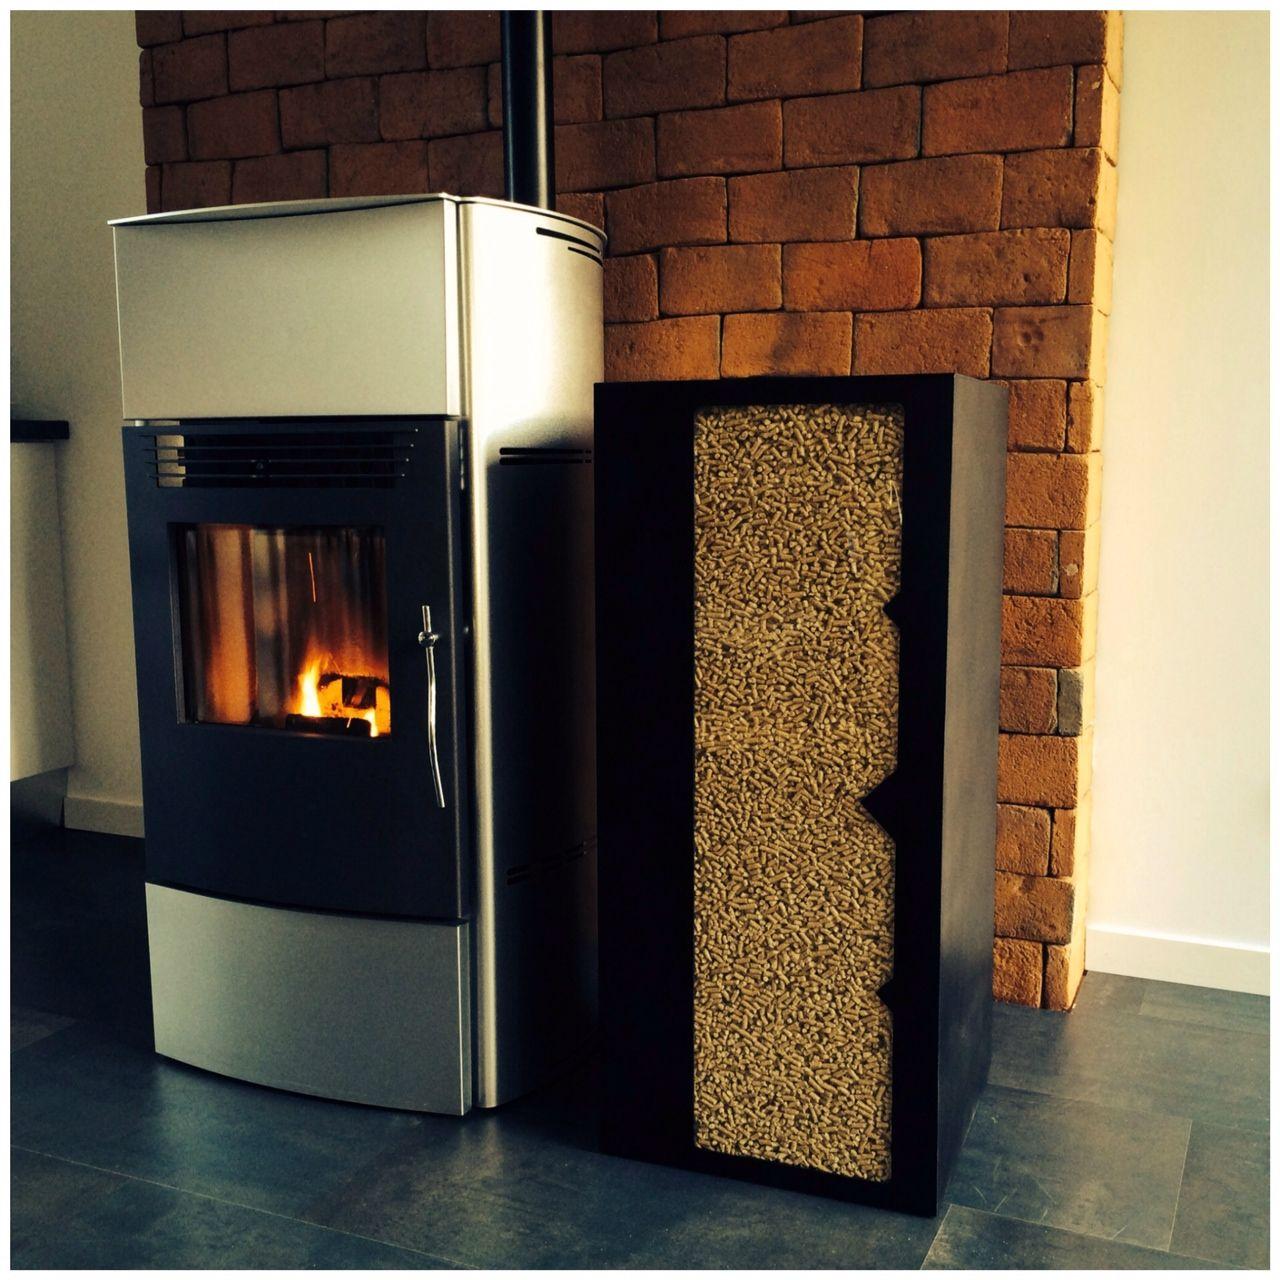 po le garnule stove italy model tosca avec un. Black Bedroom Furniture Sets. Home Design Ideas